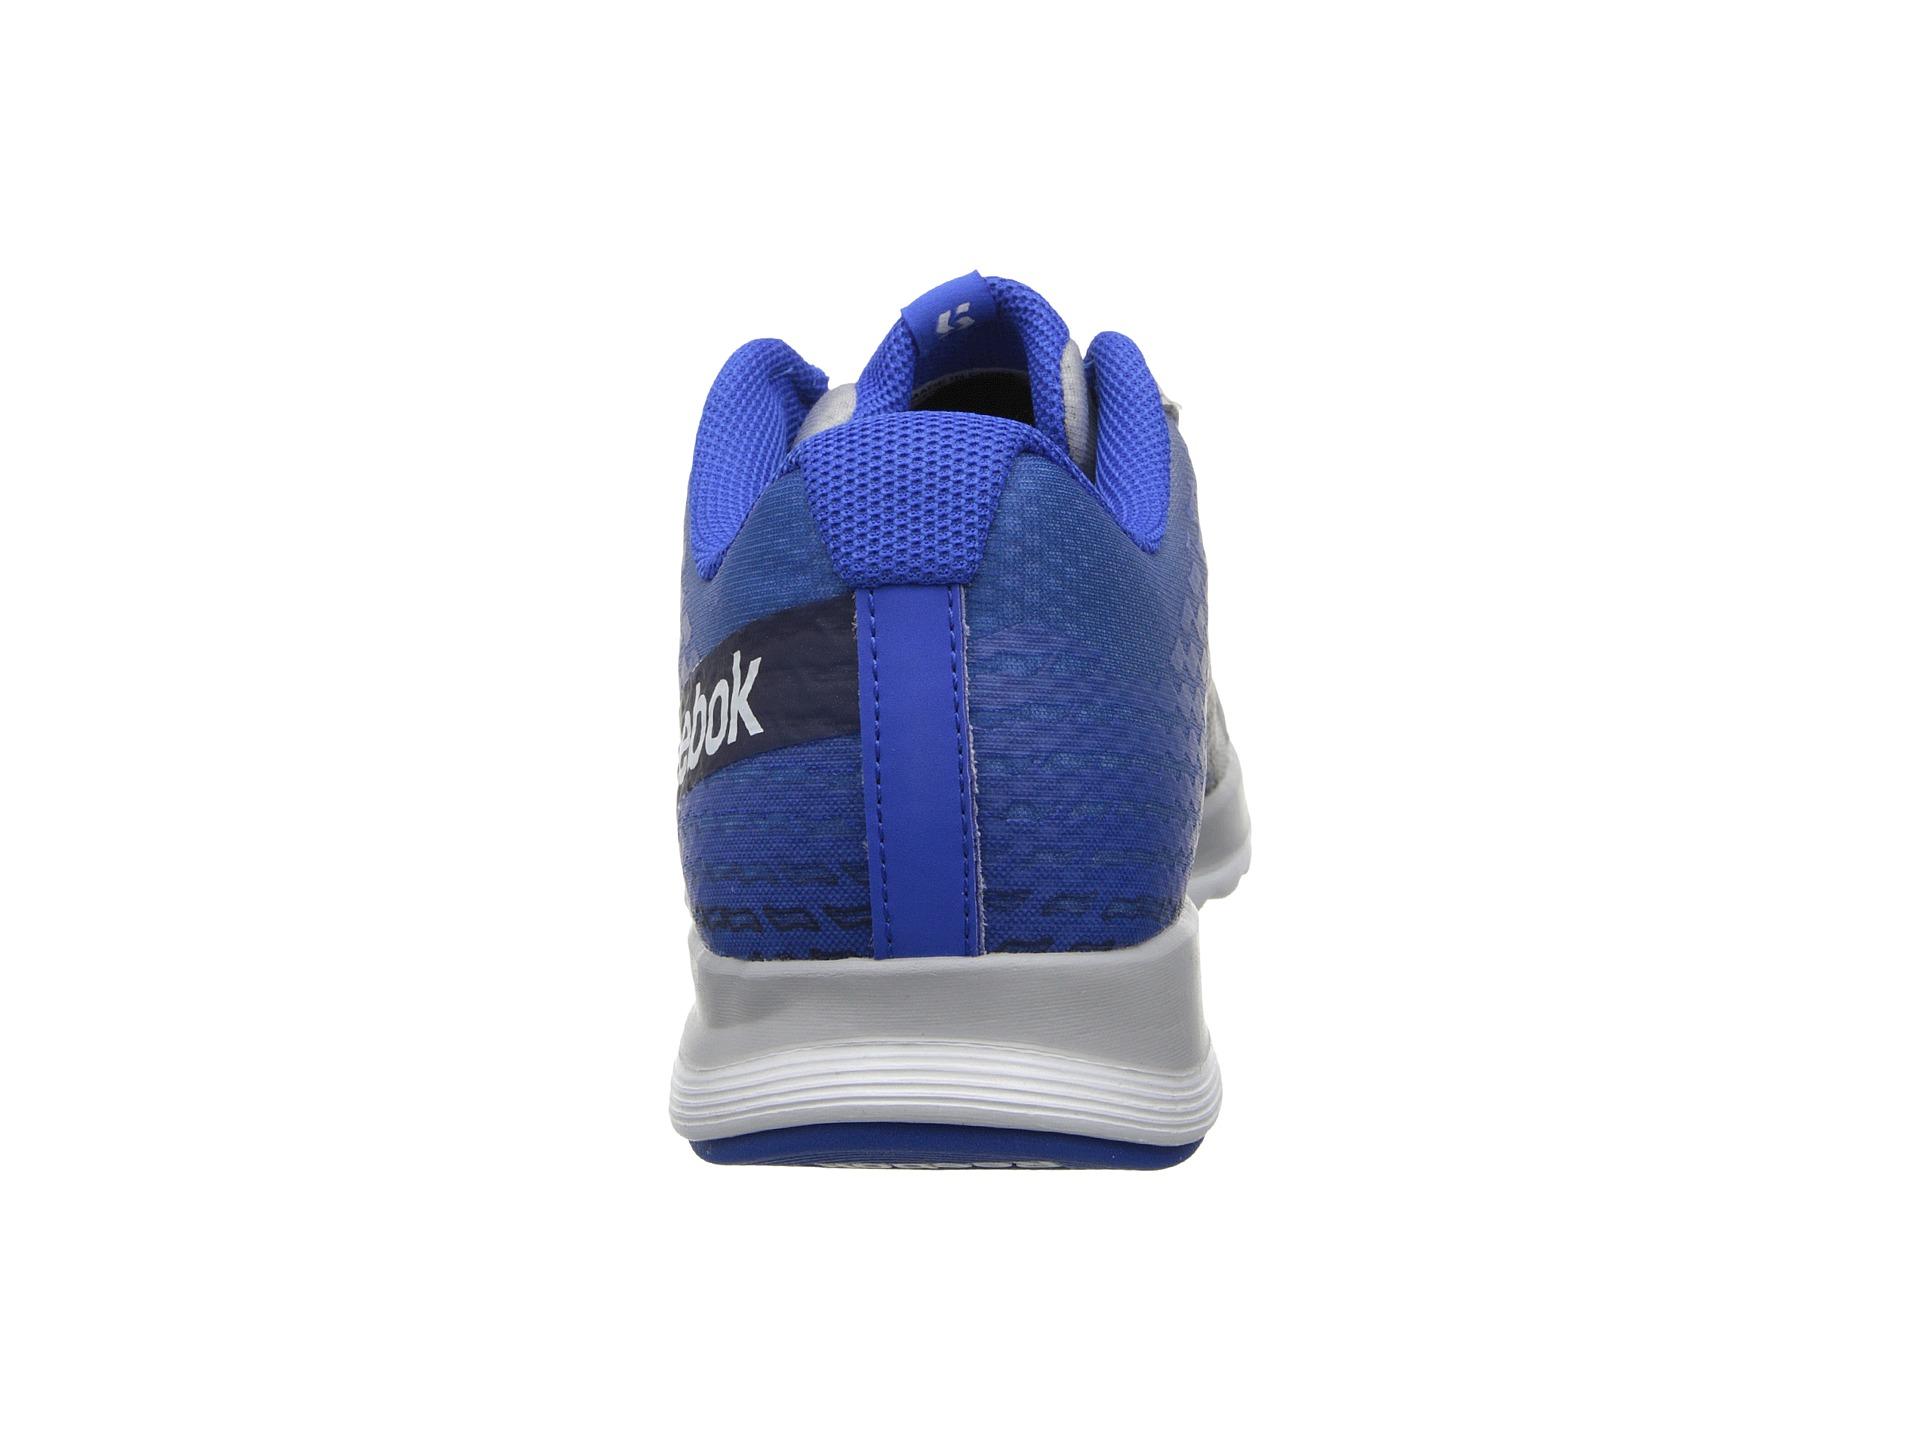 Lyst - Reebok Sublite Duo Instinct in Blue for Men 8bbe57fb1